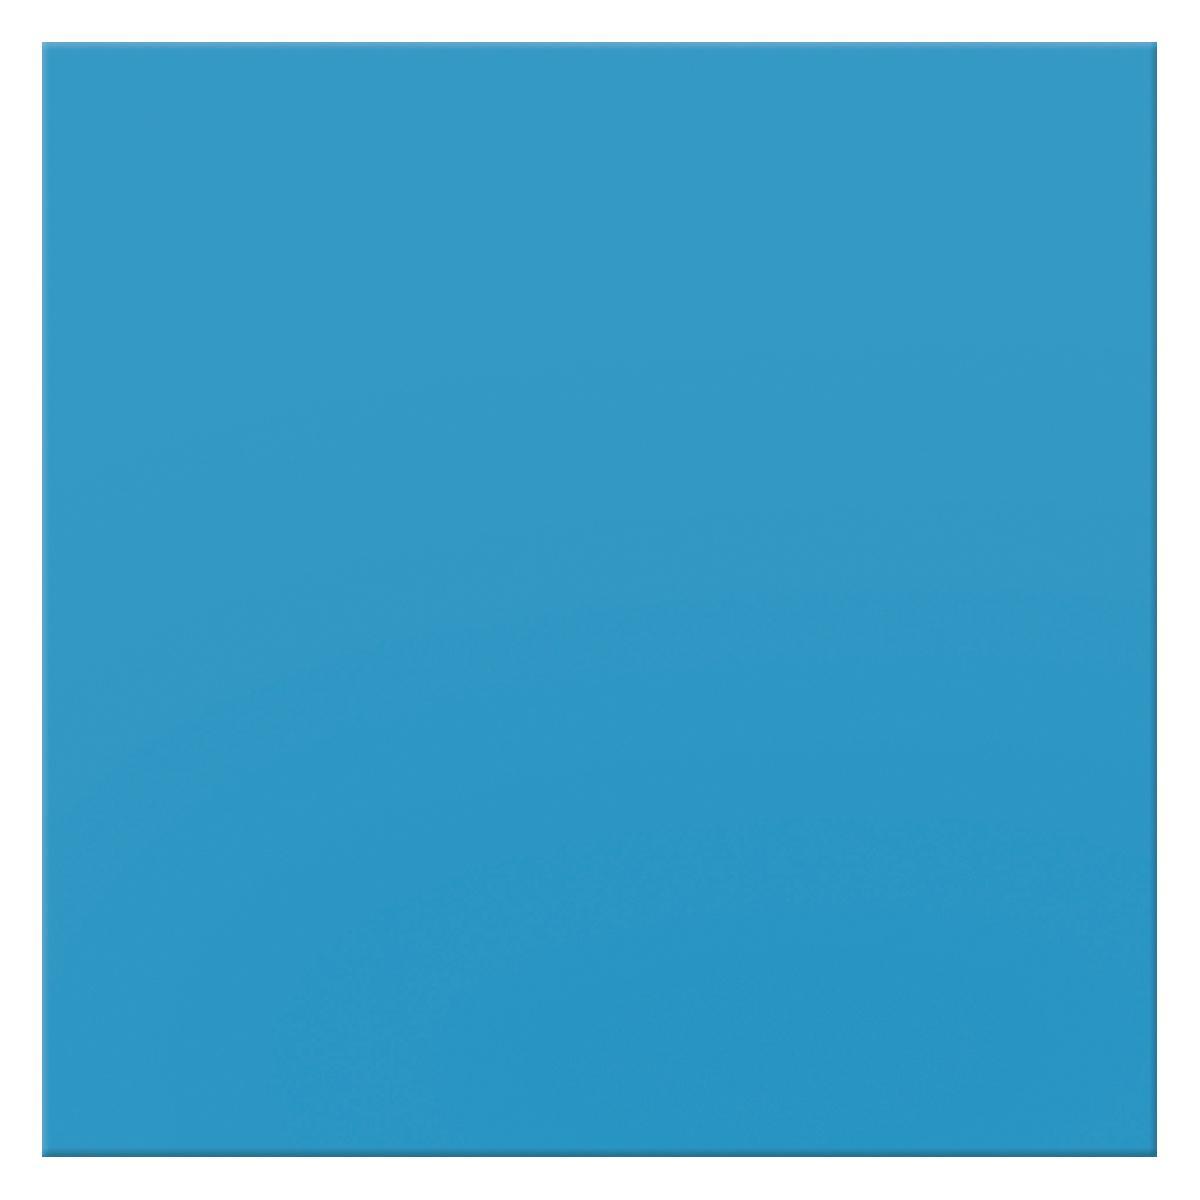 Mayólica Piscina Celeste Semi Brillante - 30X30 cm - 2.34 m2